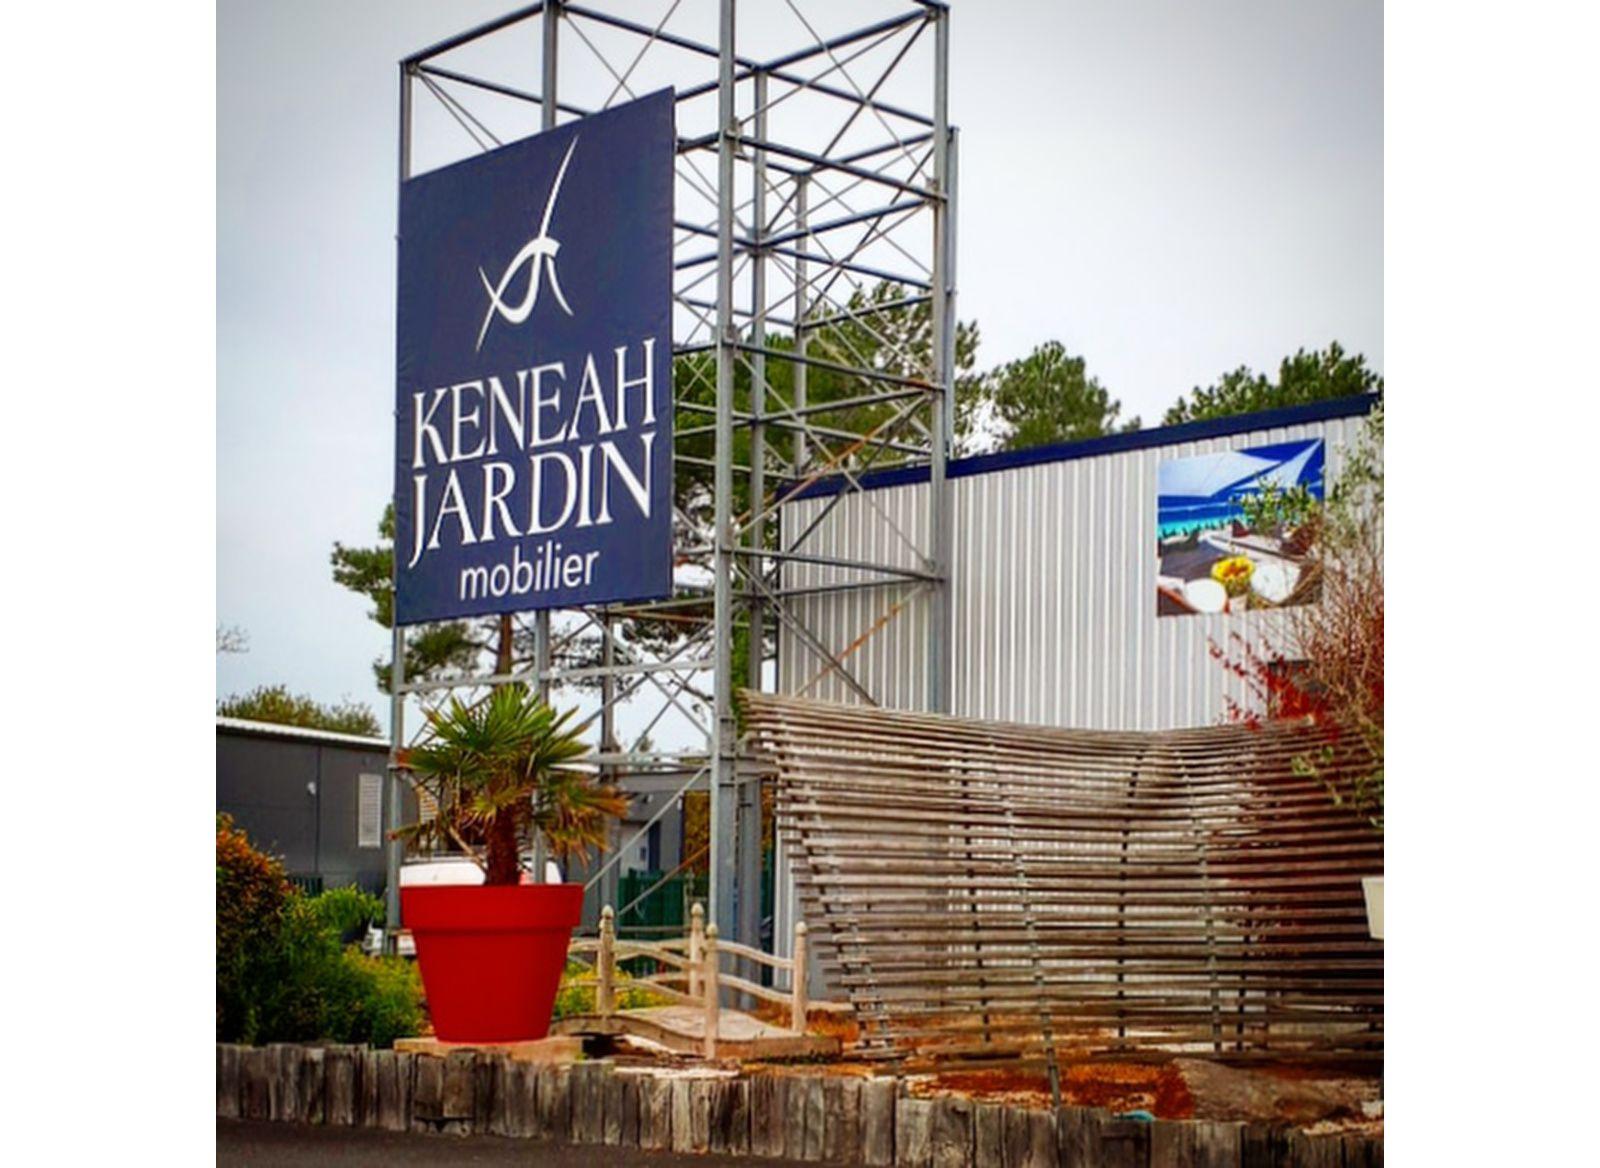 Keneah Jardin à Plougoumelen (56 400), Morbihan